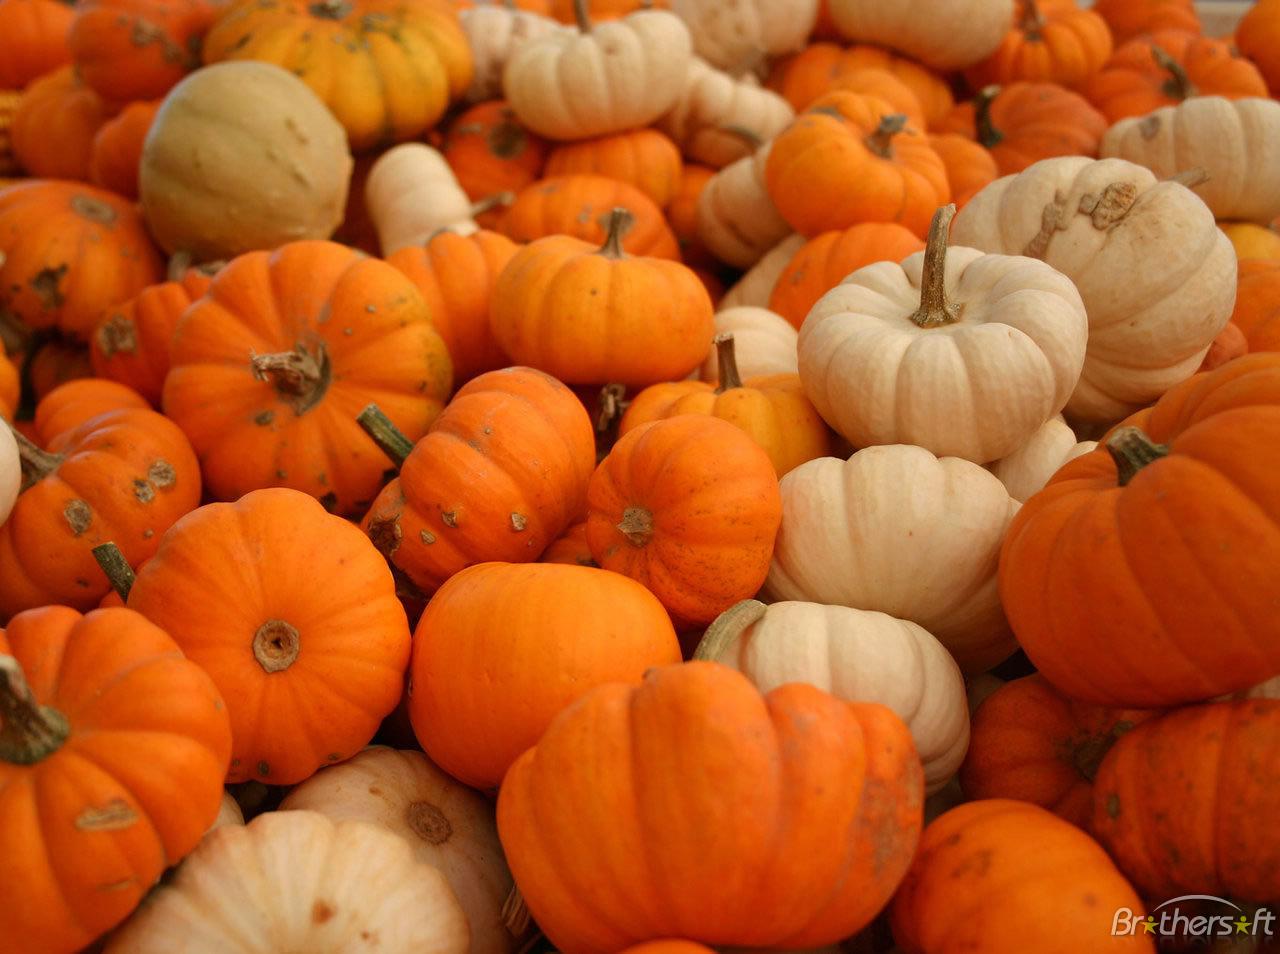 free_plenty_of_pumpkins_wallpaper-426951-1286854509